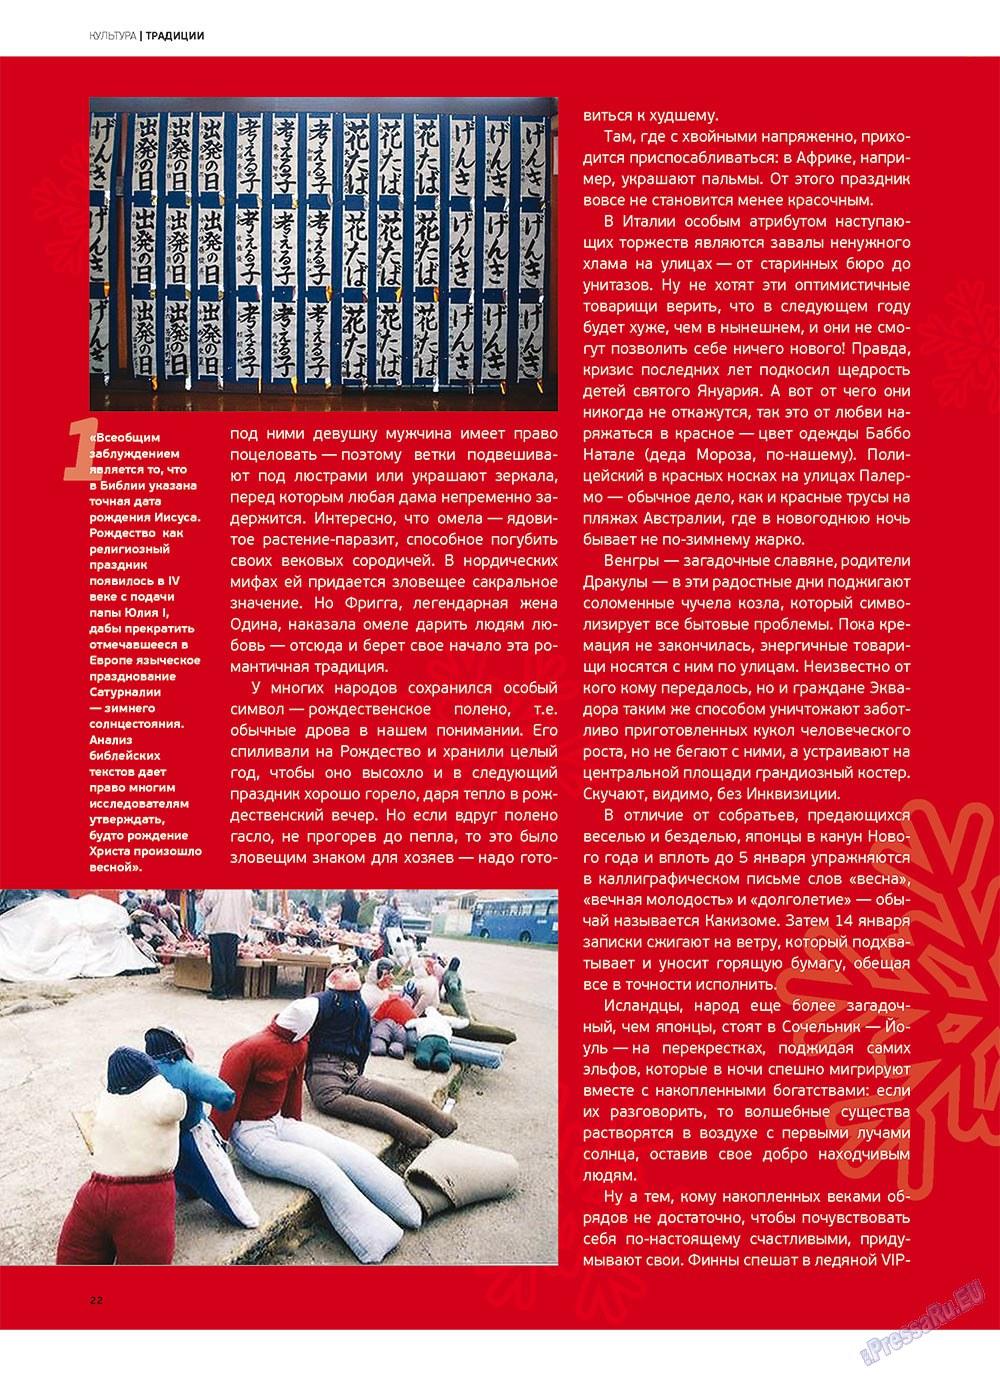 Артек (журнал). 2011 год, номер 5, стр. 24